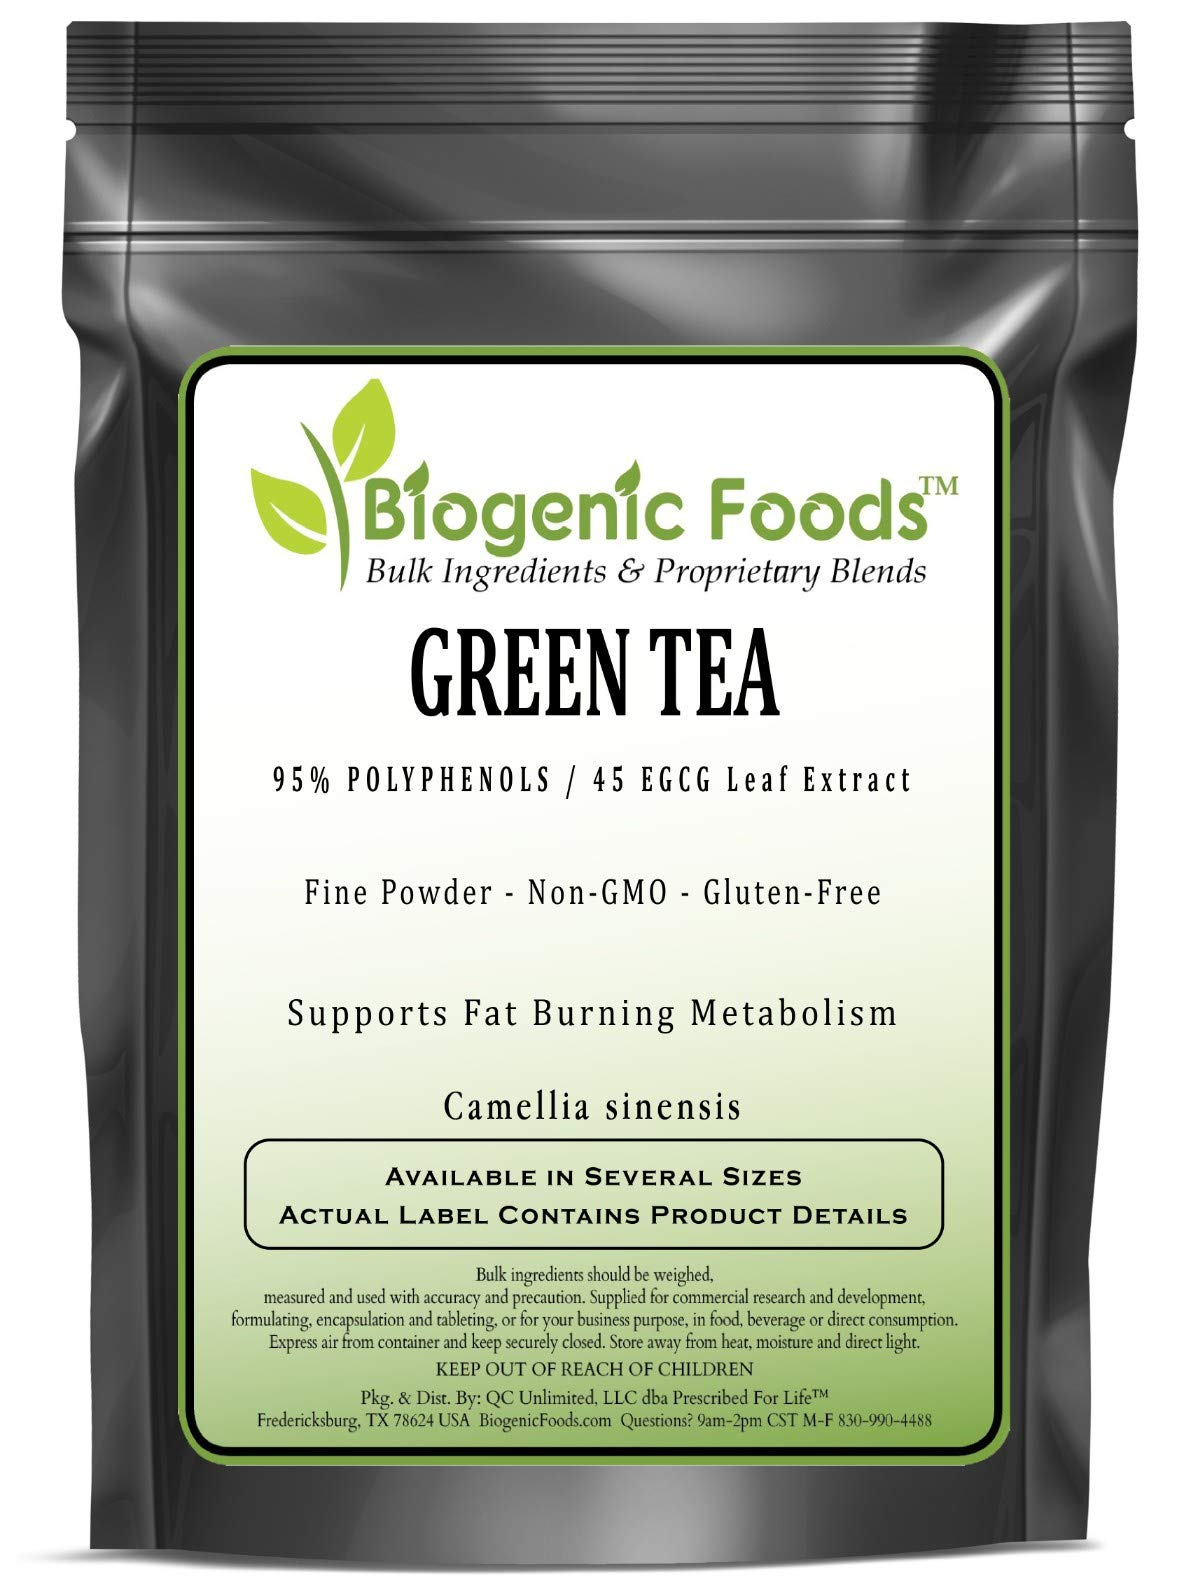 Green Tea - 95% POLYPHENOLS / 45 EGCG Leaf Fine Powder Extract (Camellia sinensis), 1 kg